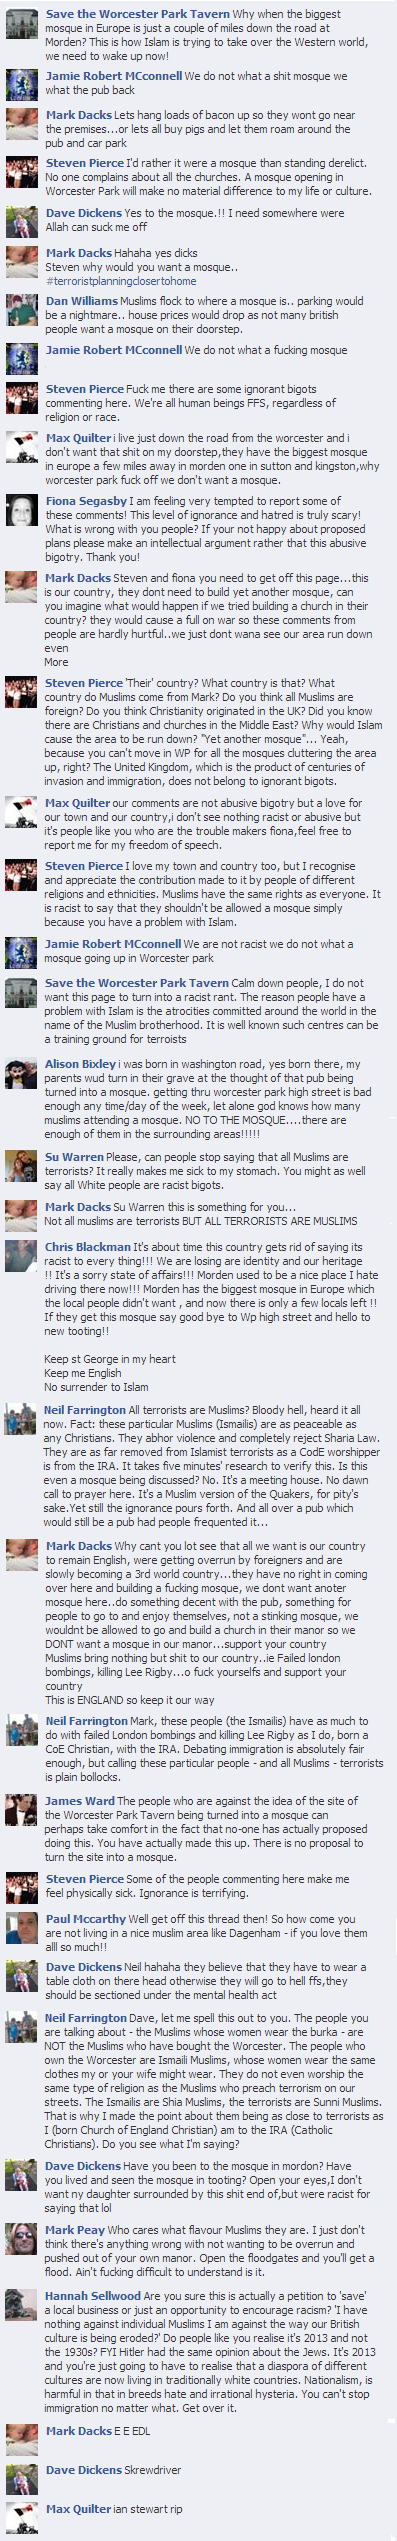 Save the Worcester Park Tavern Facebook comments